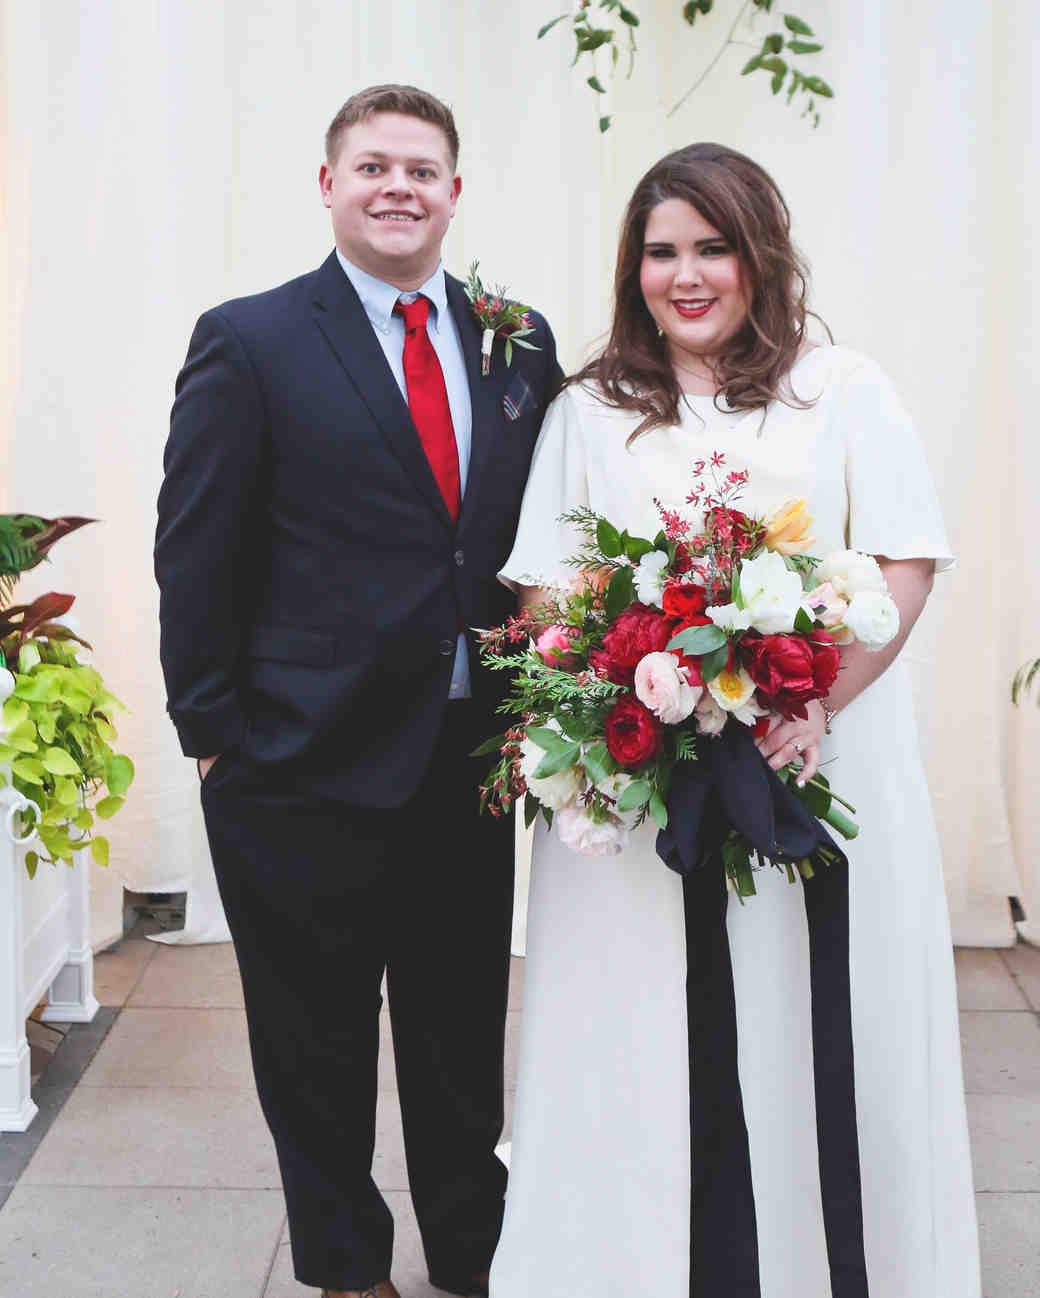 jessie-justin-wedding-couple-3-s112135-0915.jpg